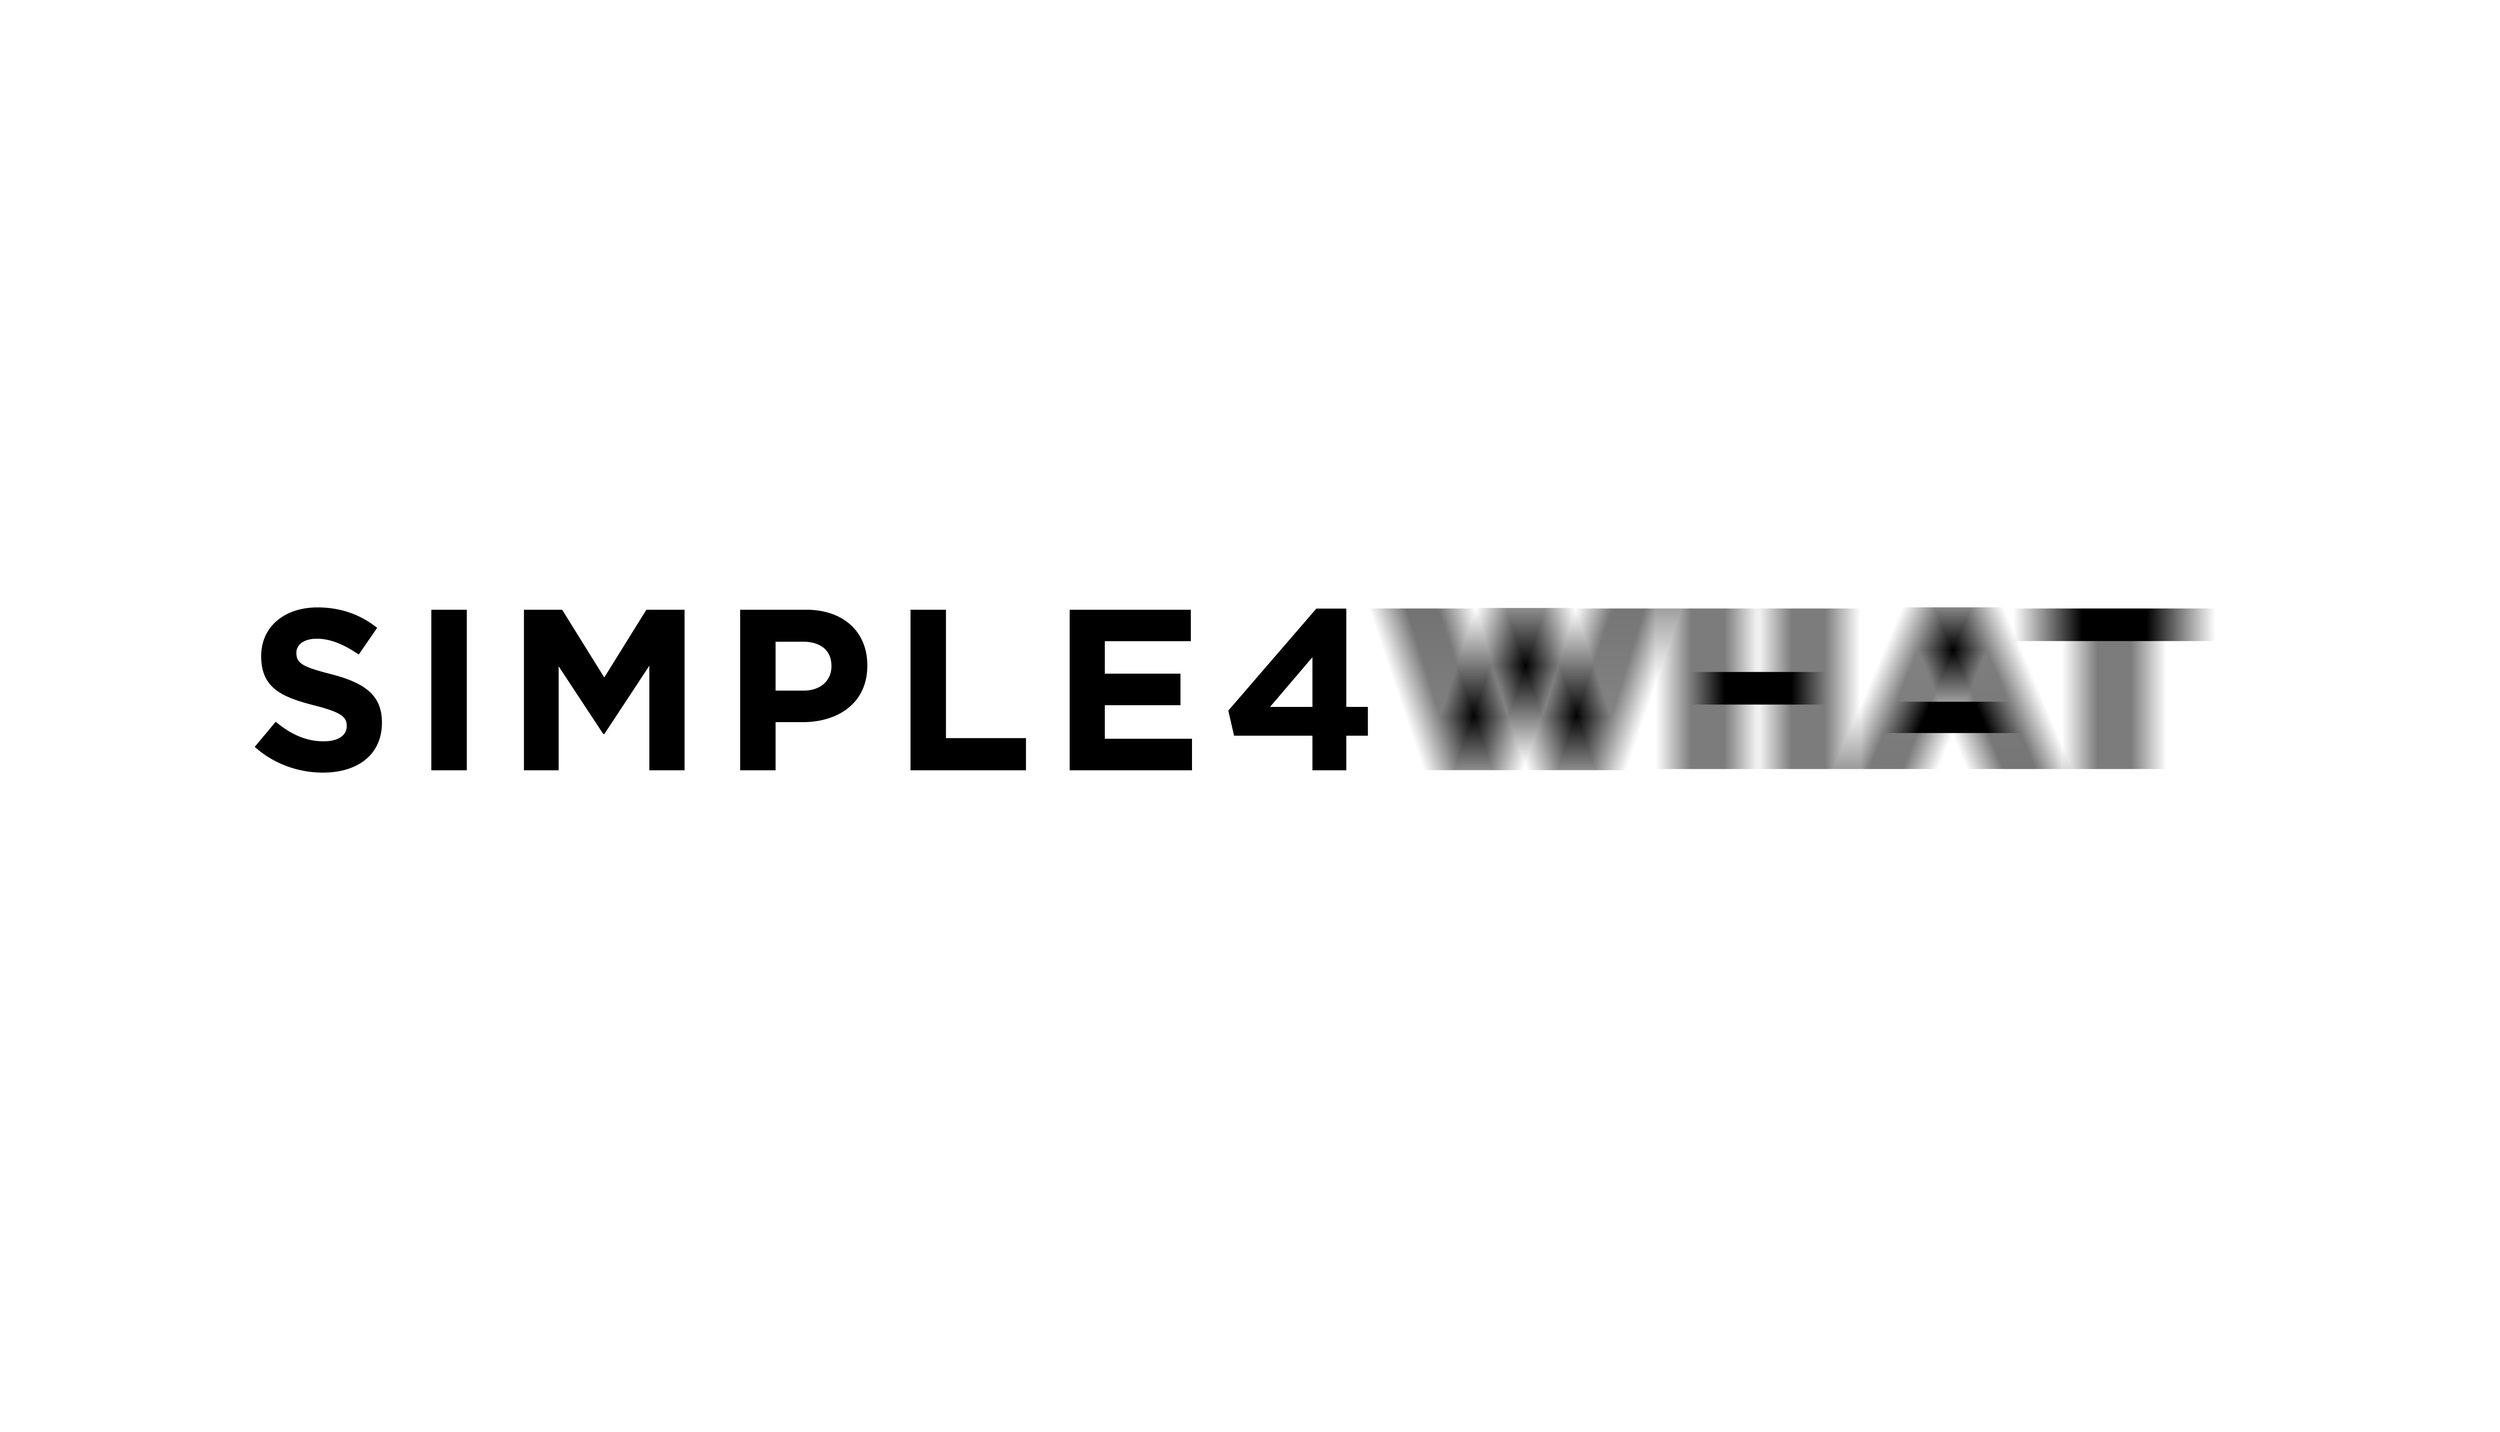 s4w blured.jpg